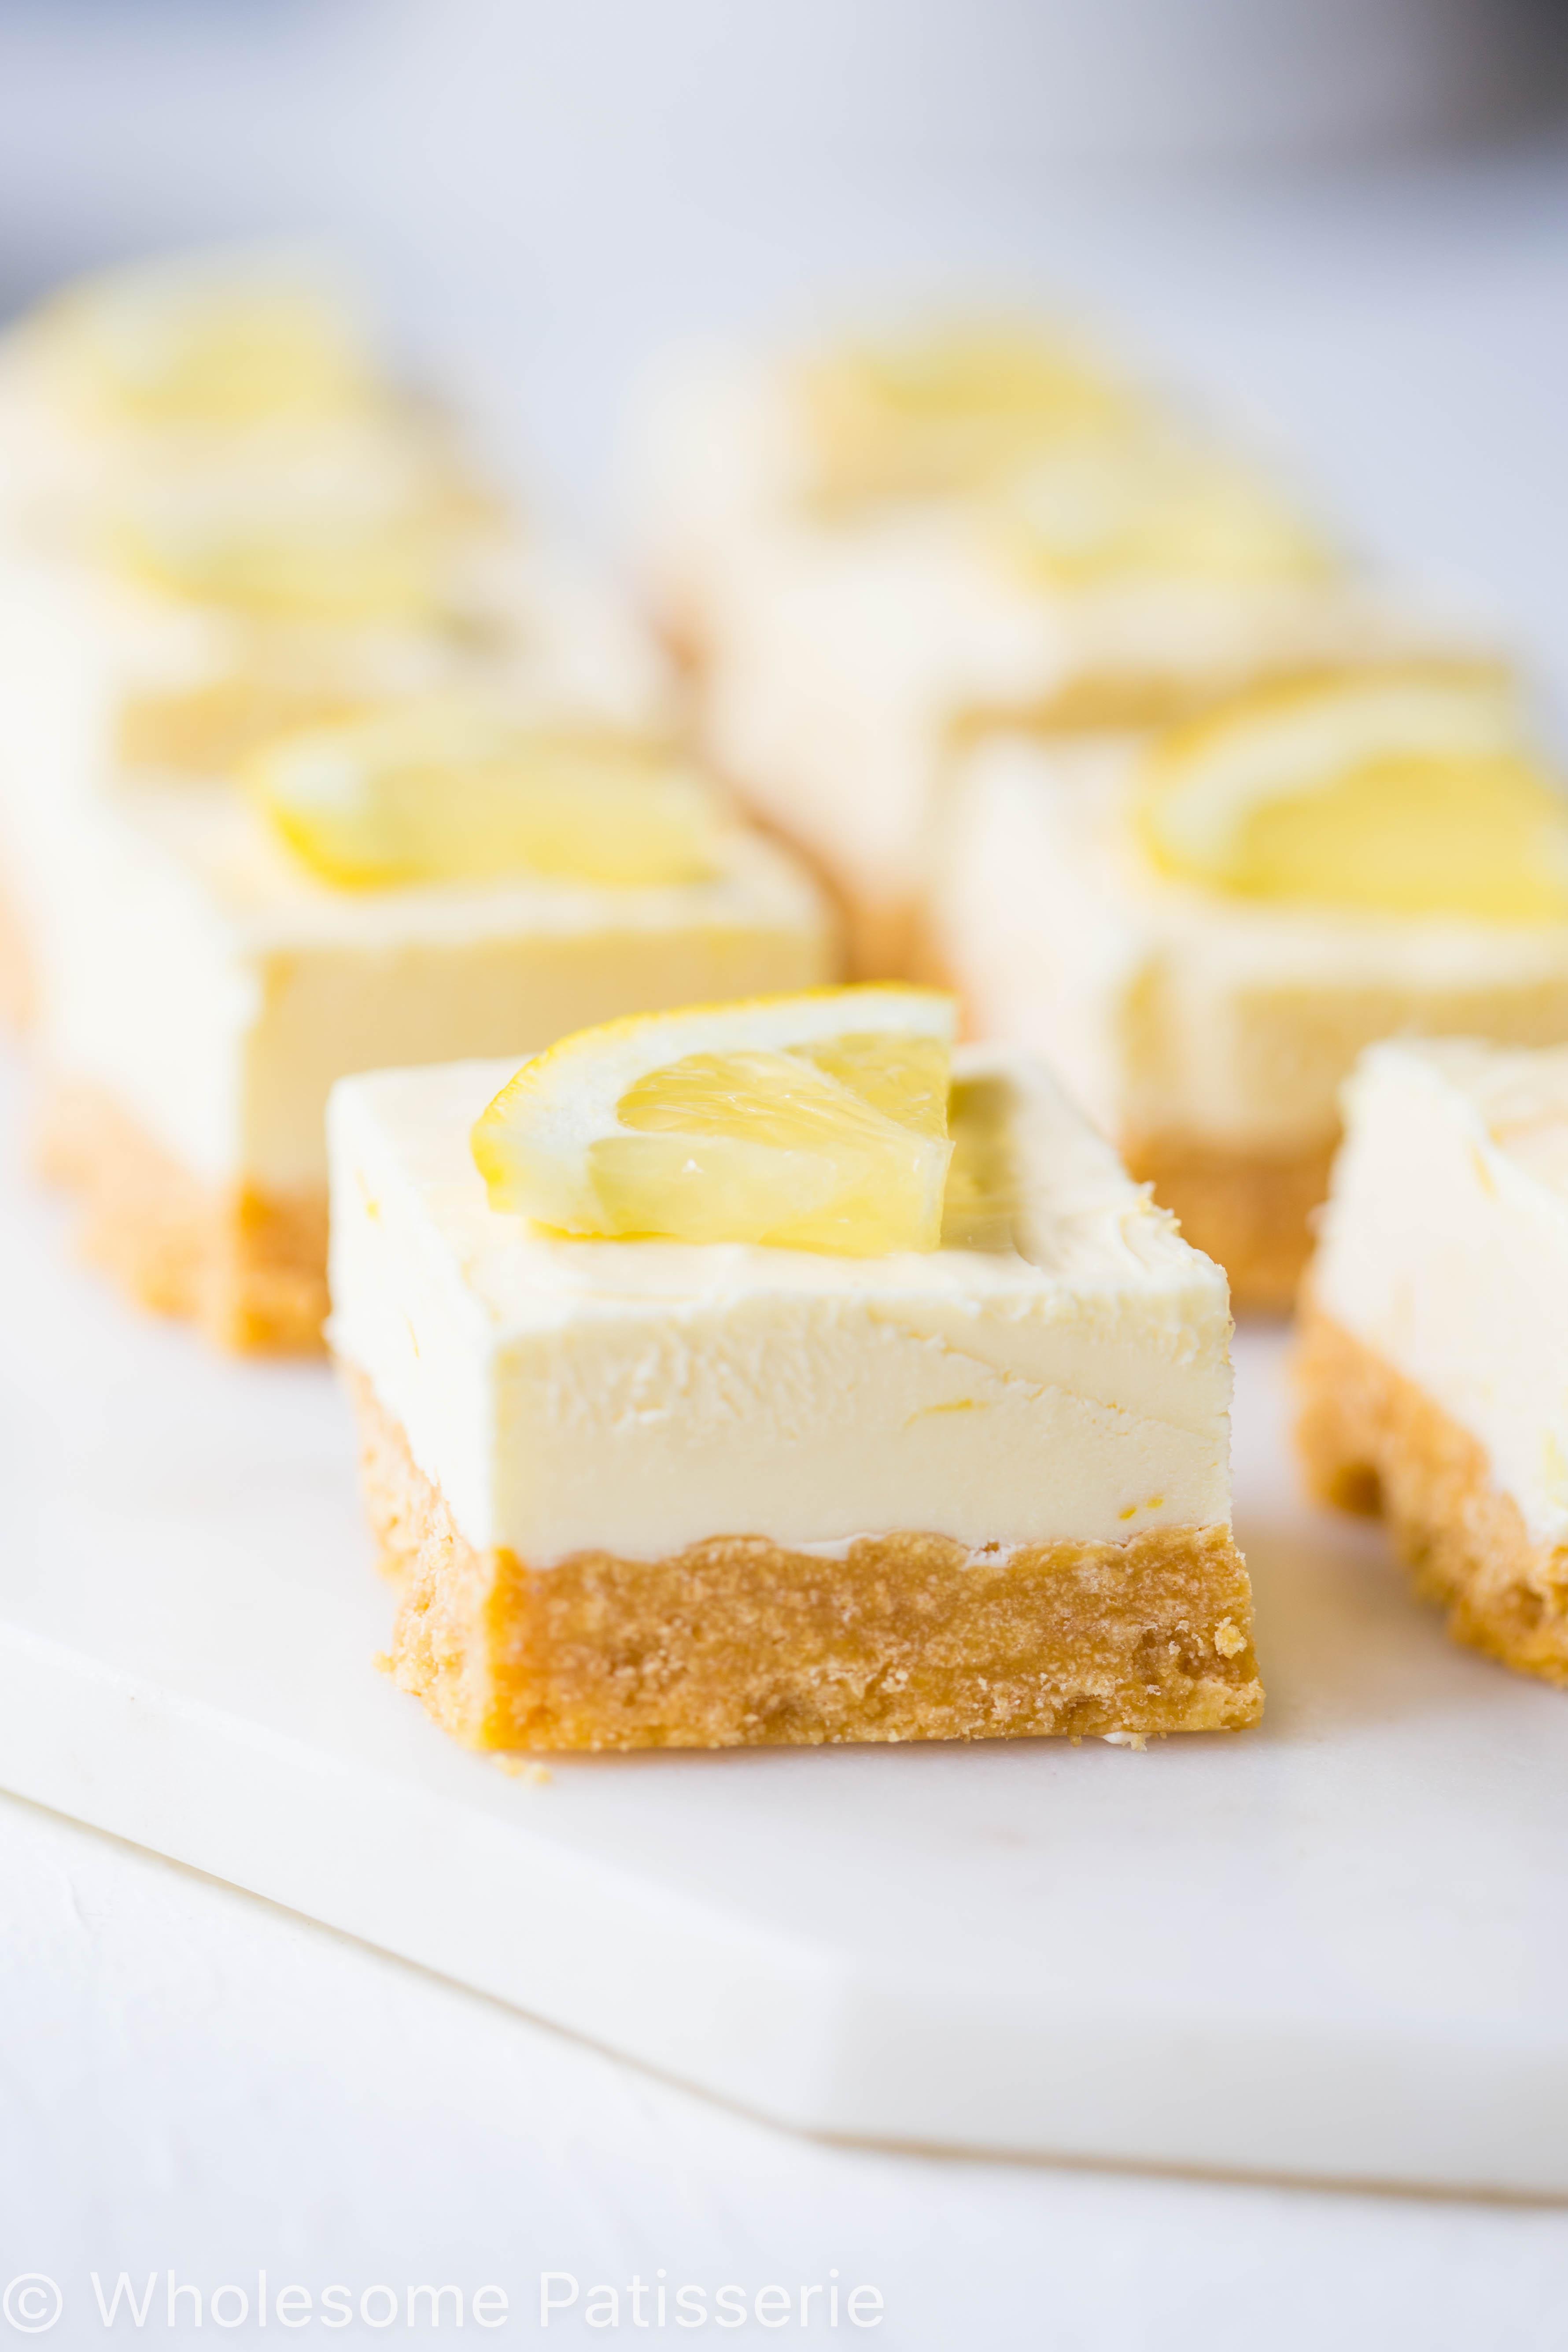 no-bake-lemon-cheesecake-slice-gluten-free-delicious-amazing-cake